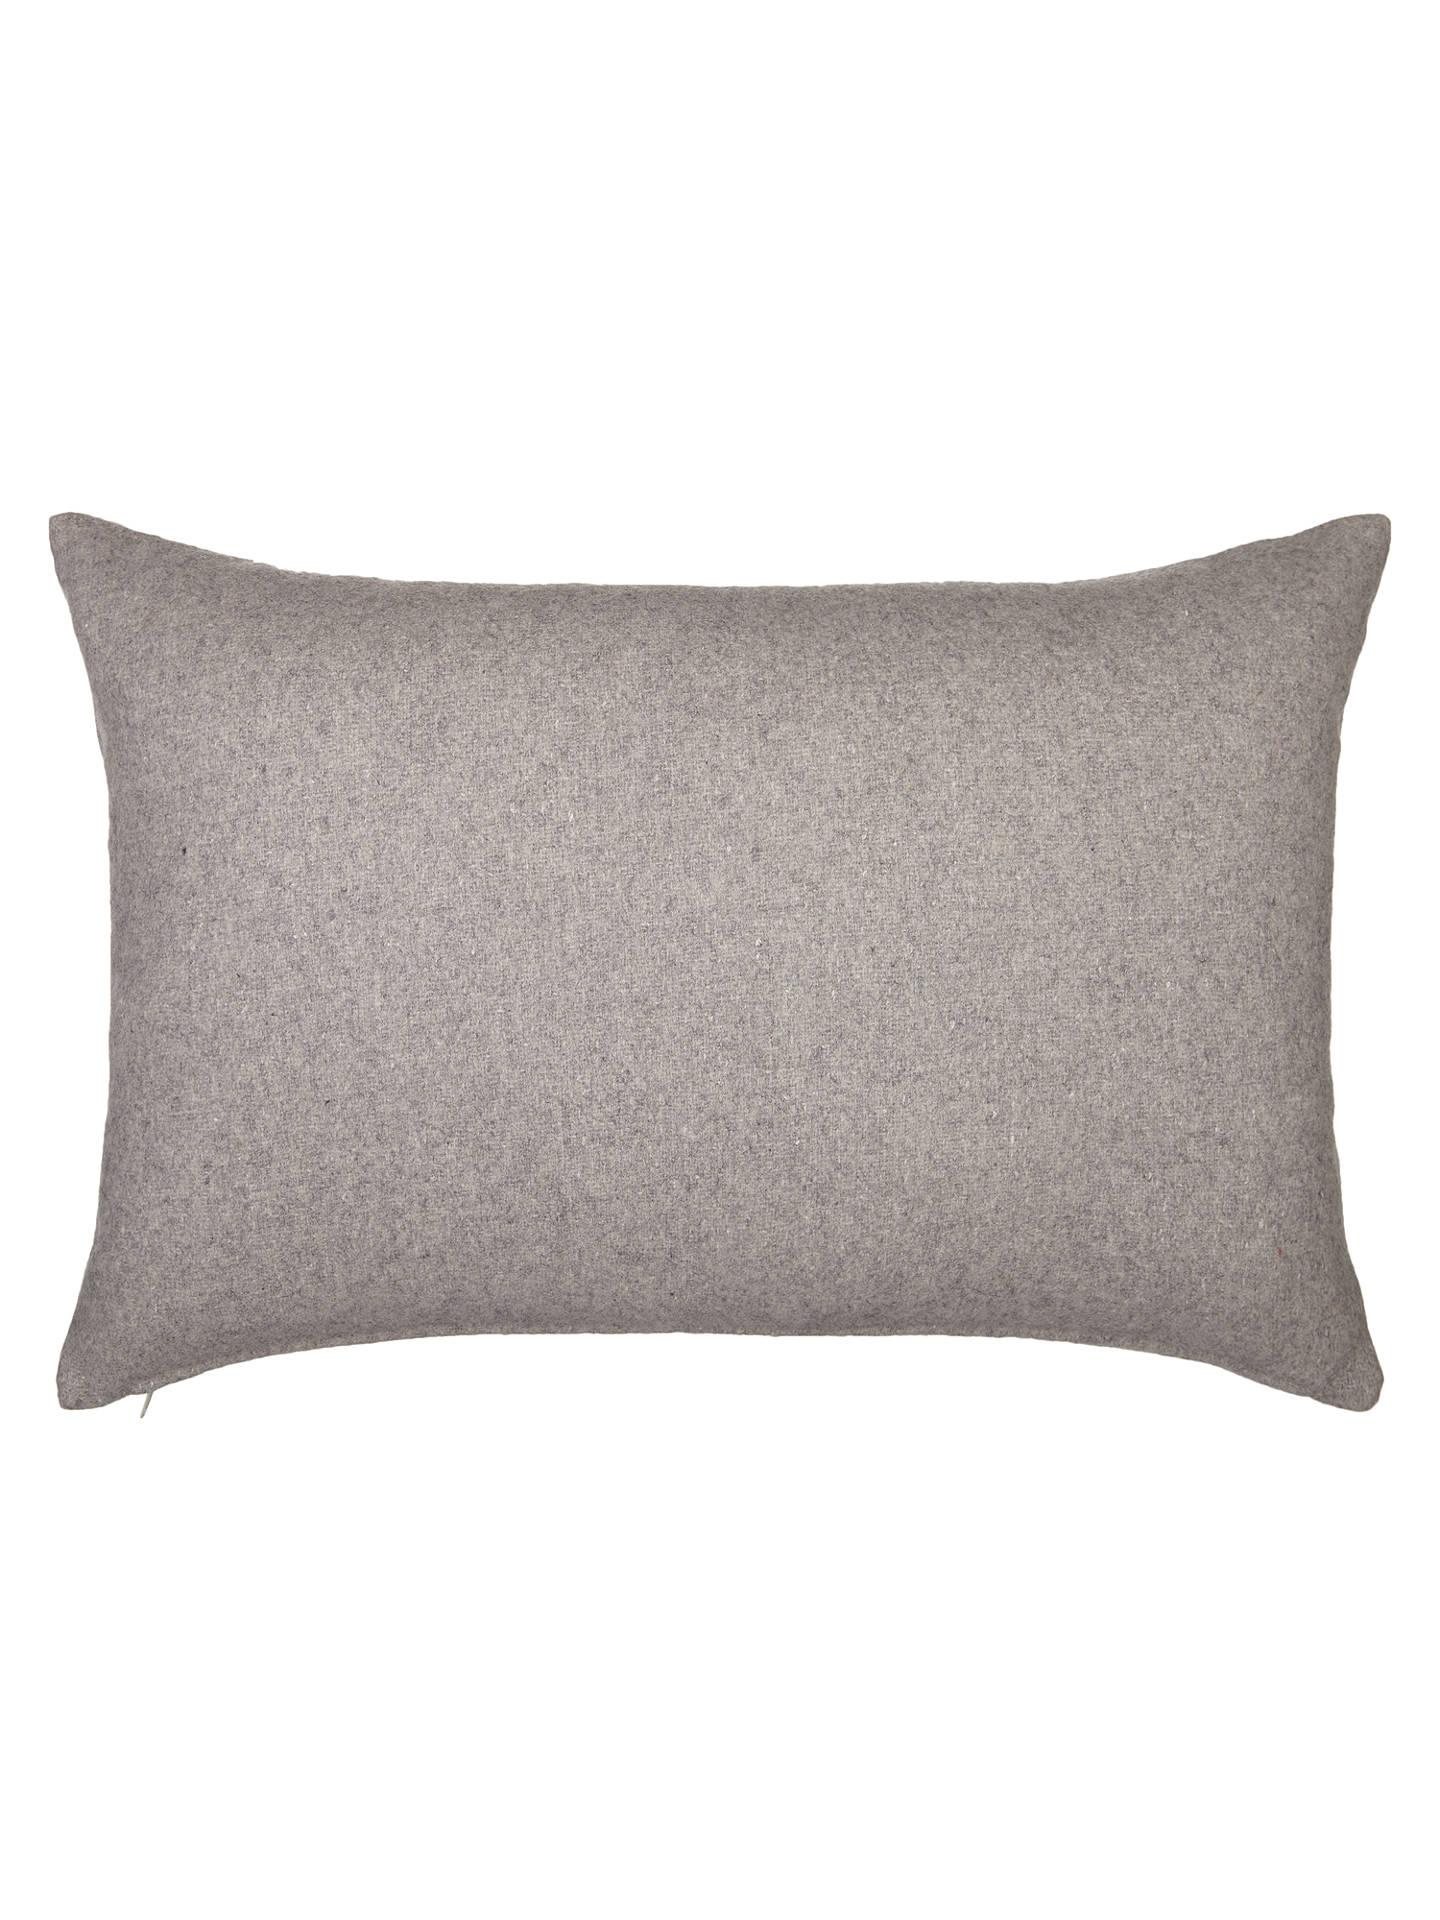 house by john lewis fragment cushion dandelion at john. Black Bedroom Furniture Sets. Home Design Ideas